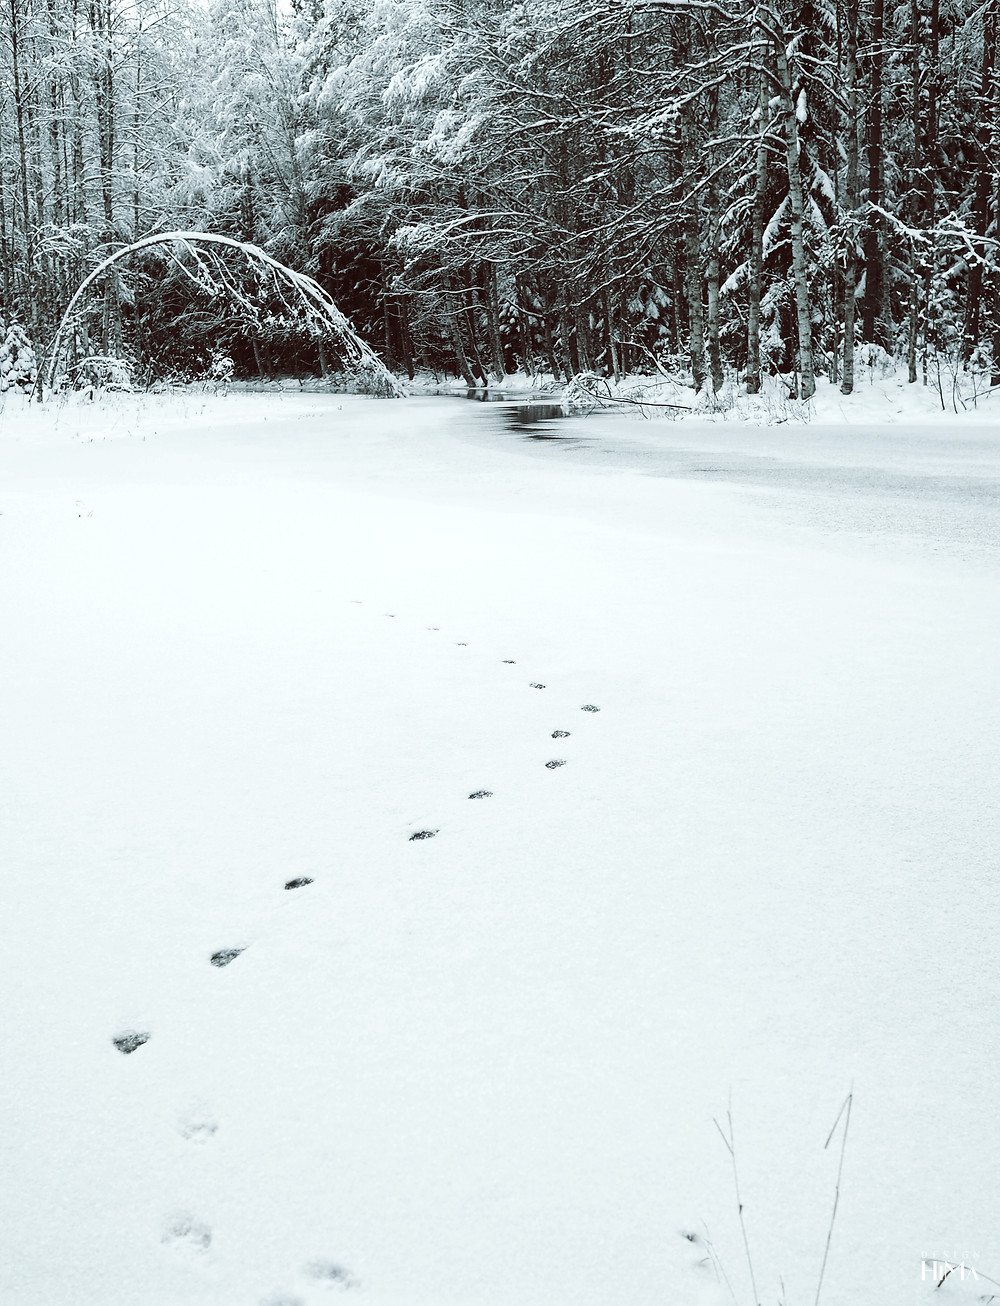 Koskikaran kierros jäljet lumessa